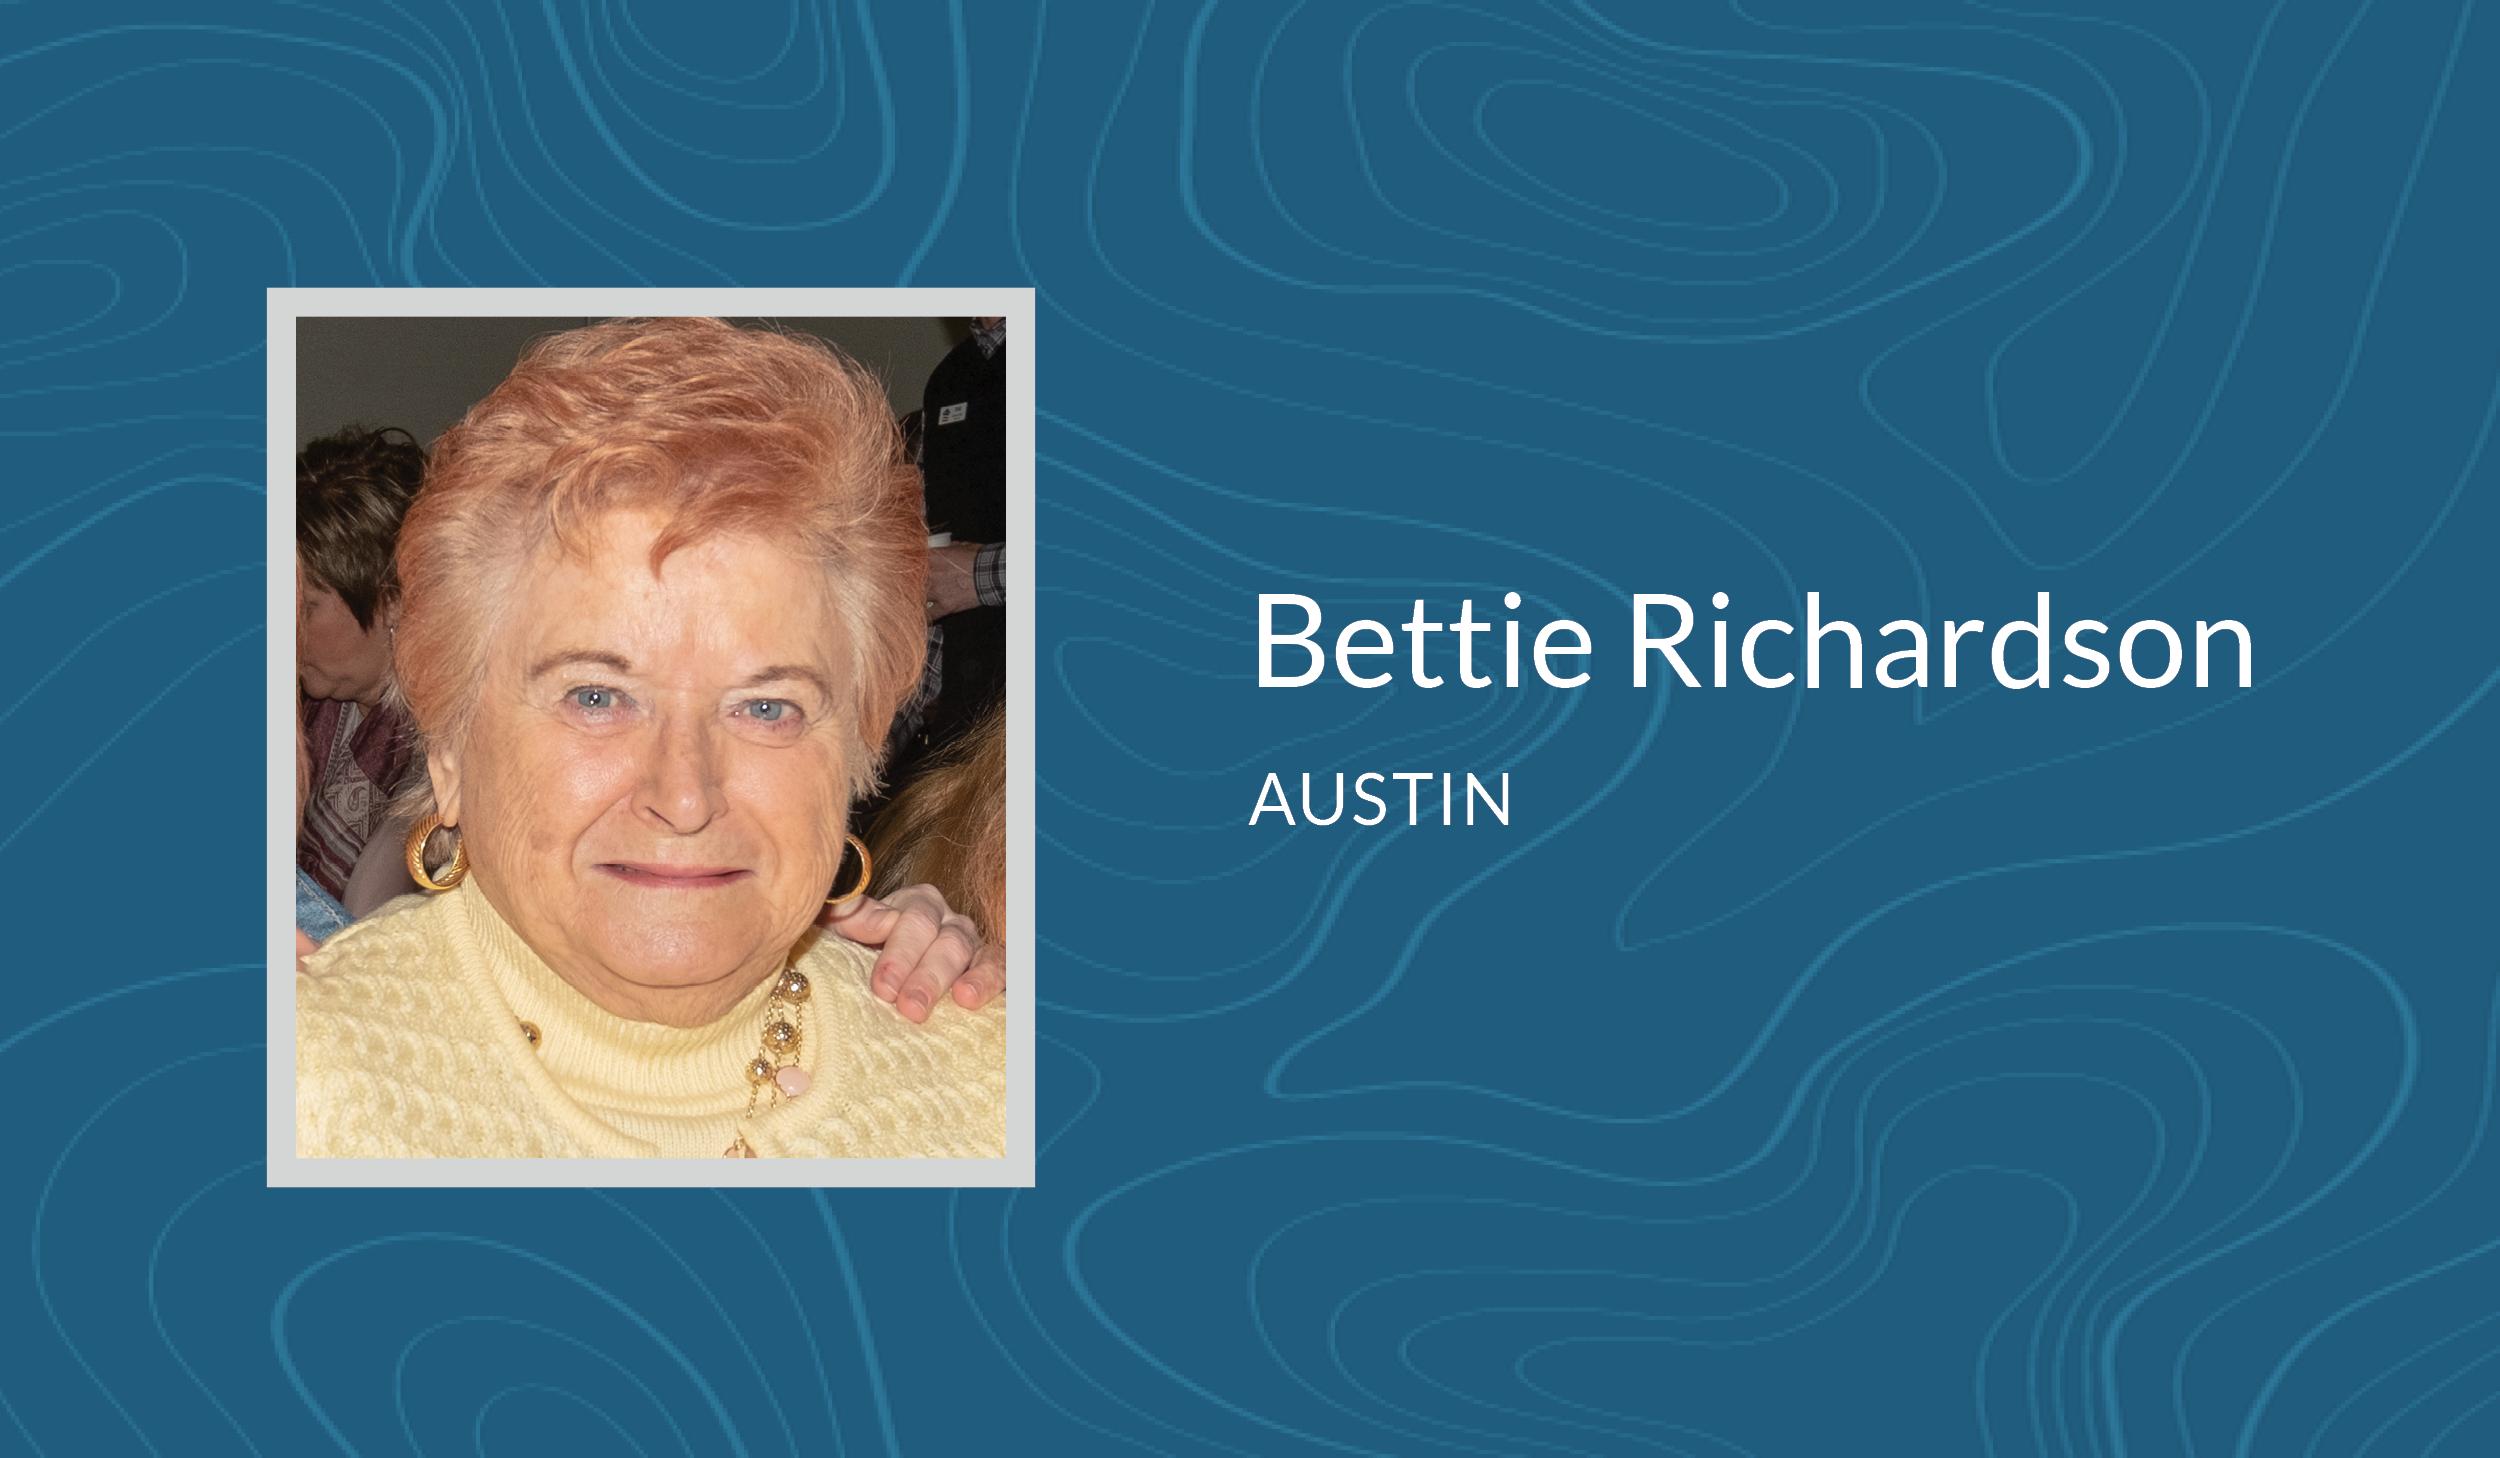 Bettie Richardson Landing Page Headers.png